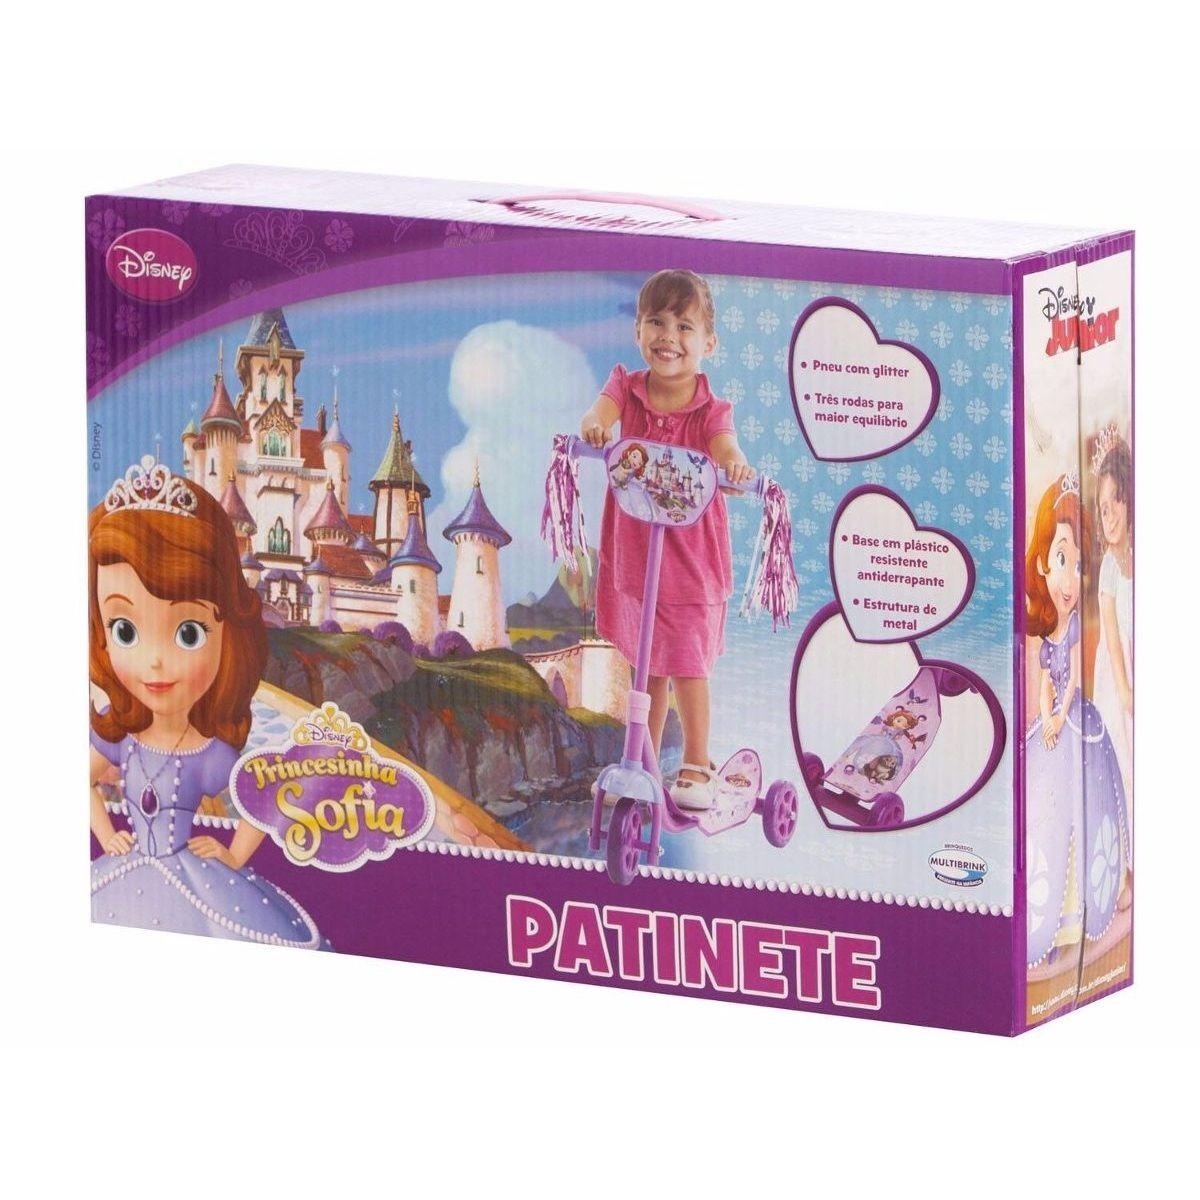 Patinete Princesinha Sofia Disney 3 Rodas  - Multibrink